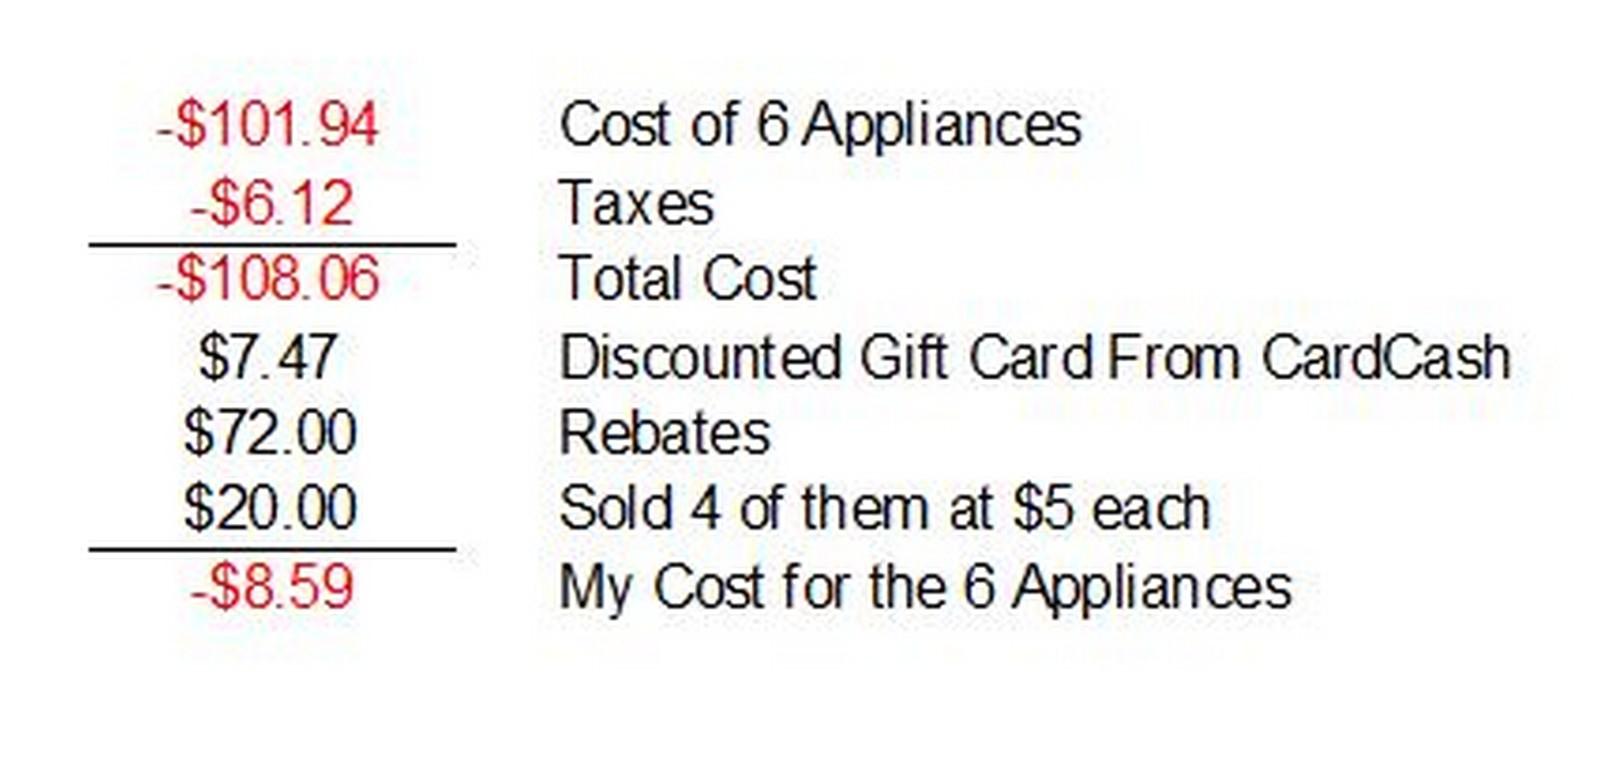 Selling Kohl's Personal Appliances